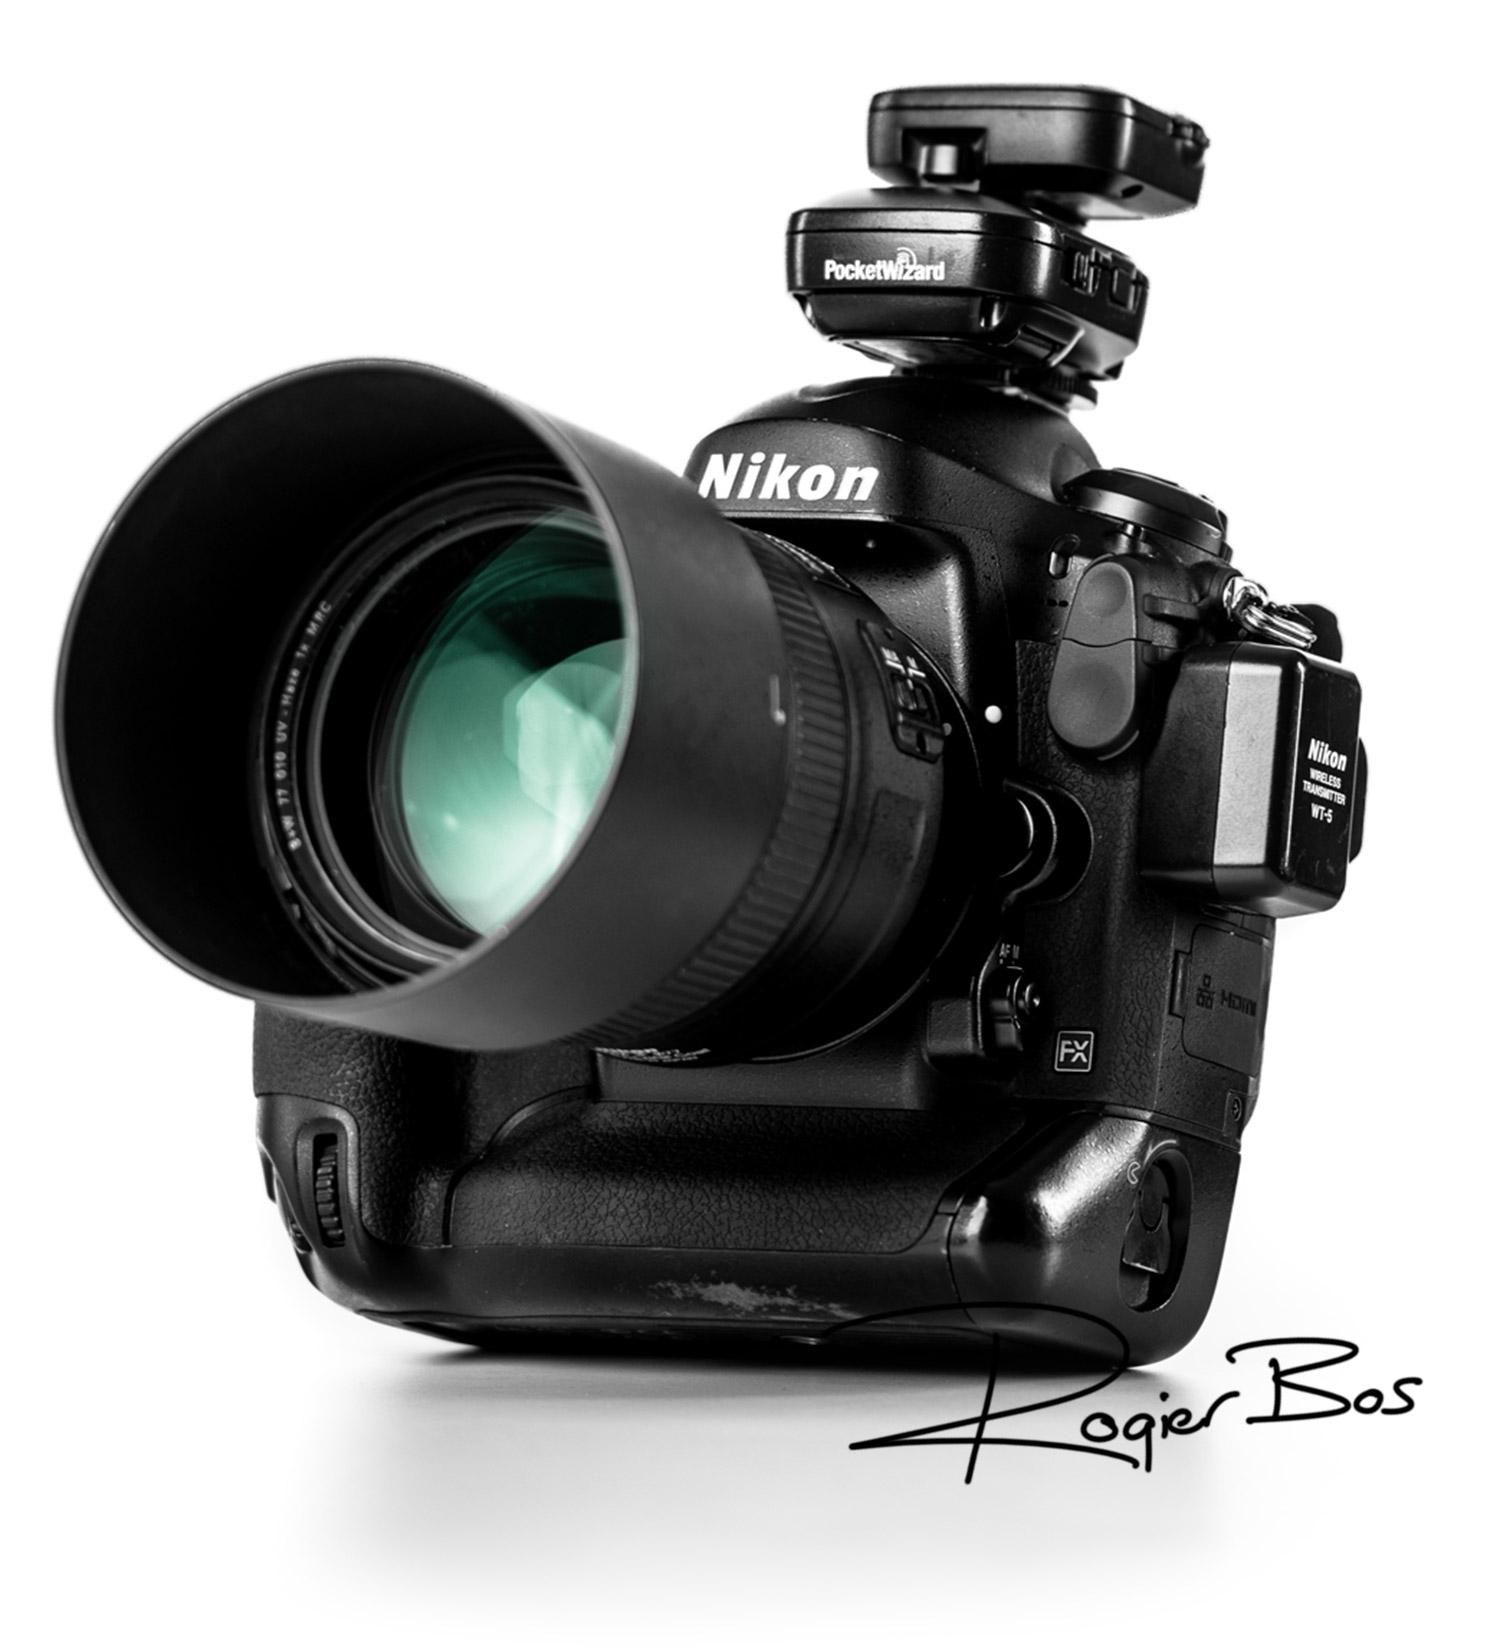 Camerawhite